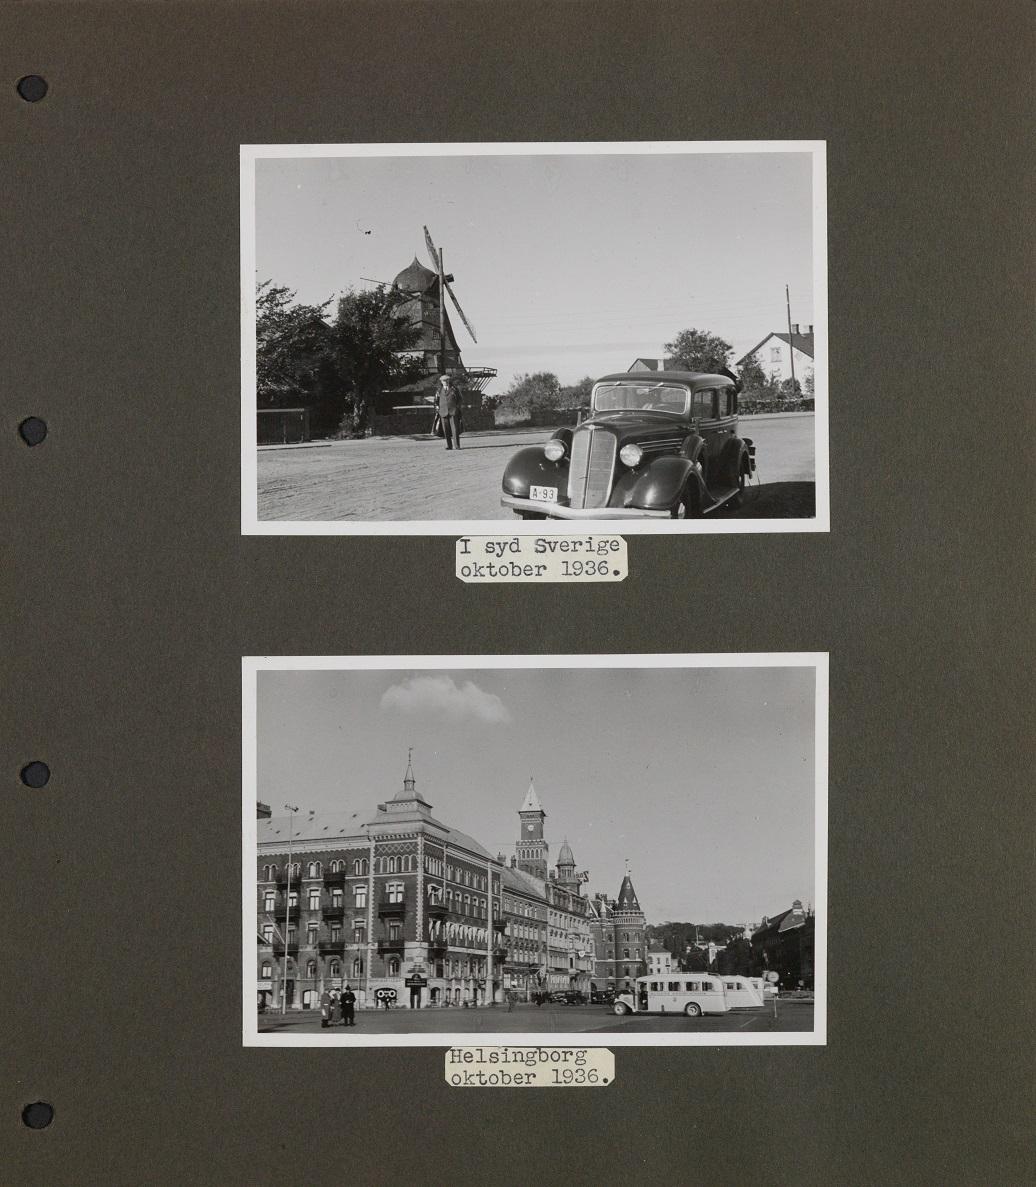 Bildet er en kopi hentet fra album Y i Utrykningspolitiets fotosamling